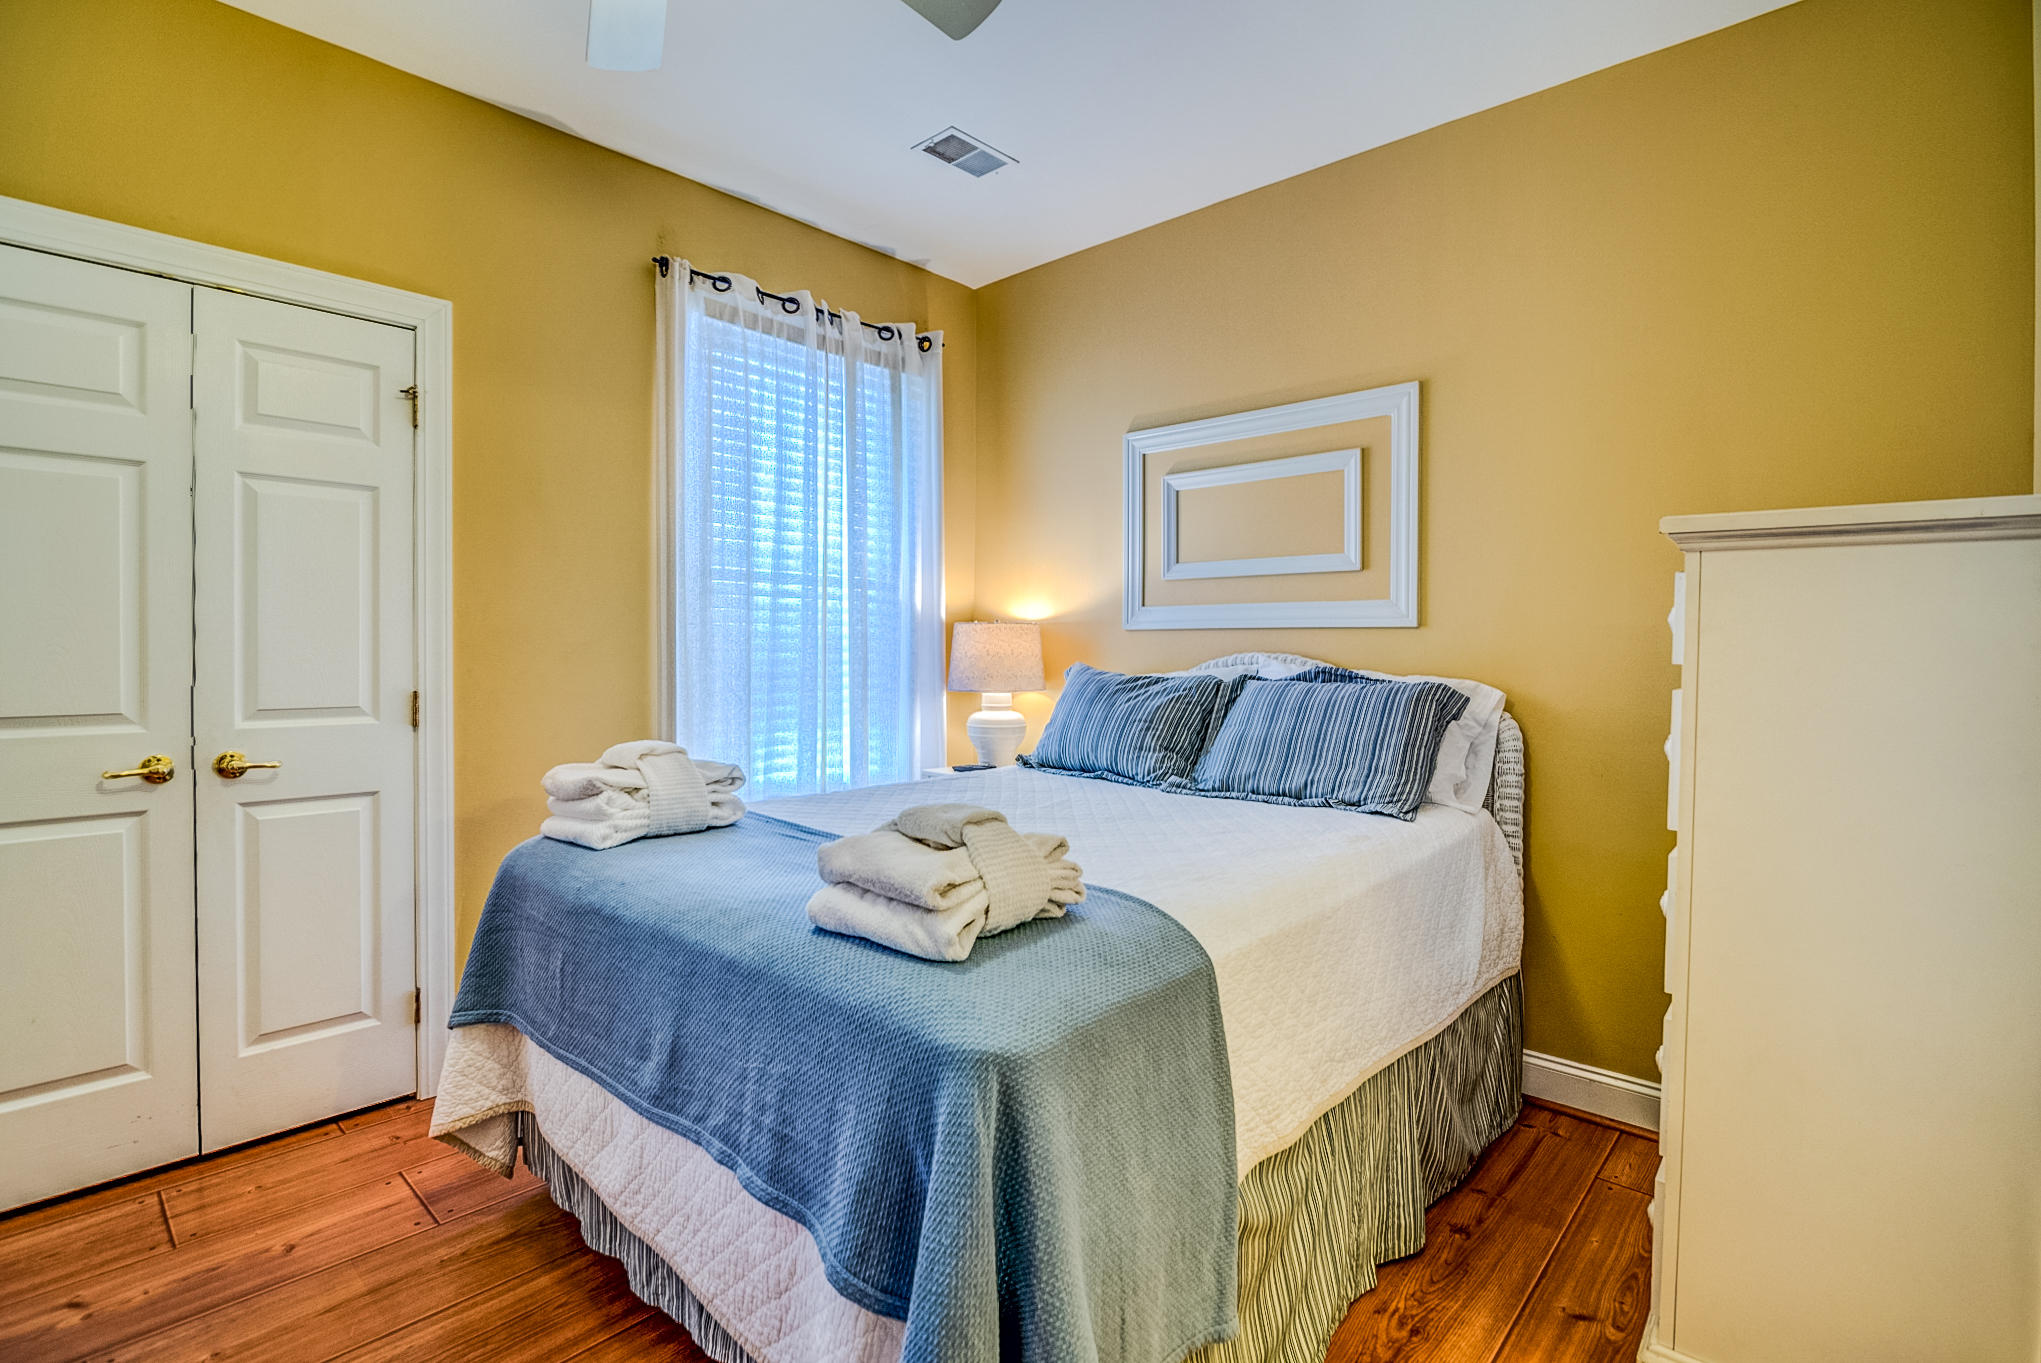 Ocean Pointe Villas Homes For Sale - 214 Arctic, Folly Beach, SC - 14